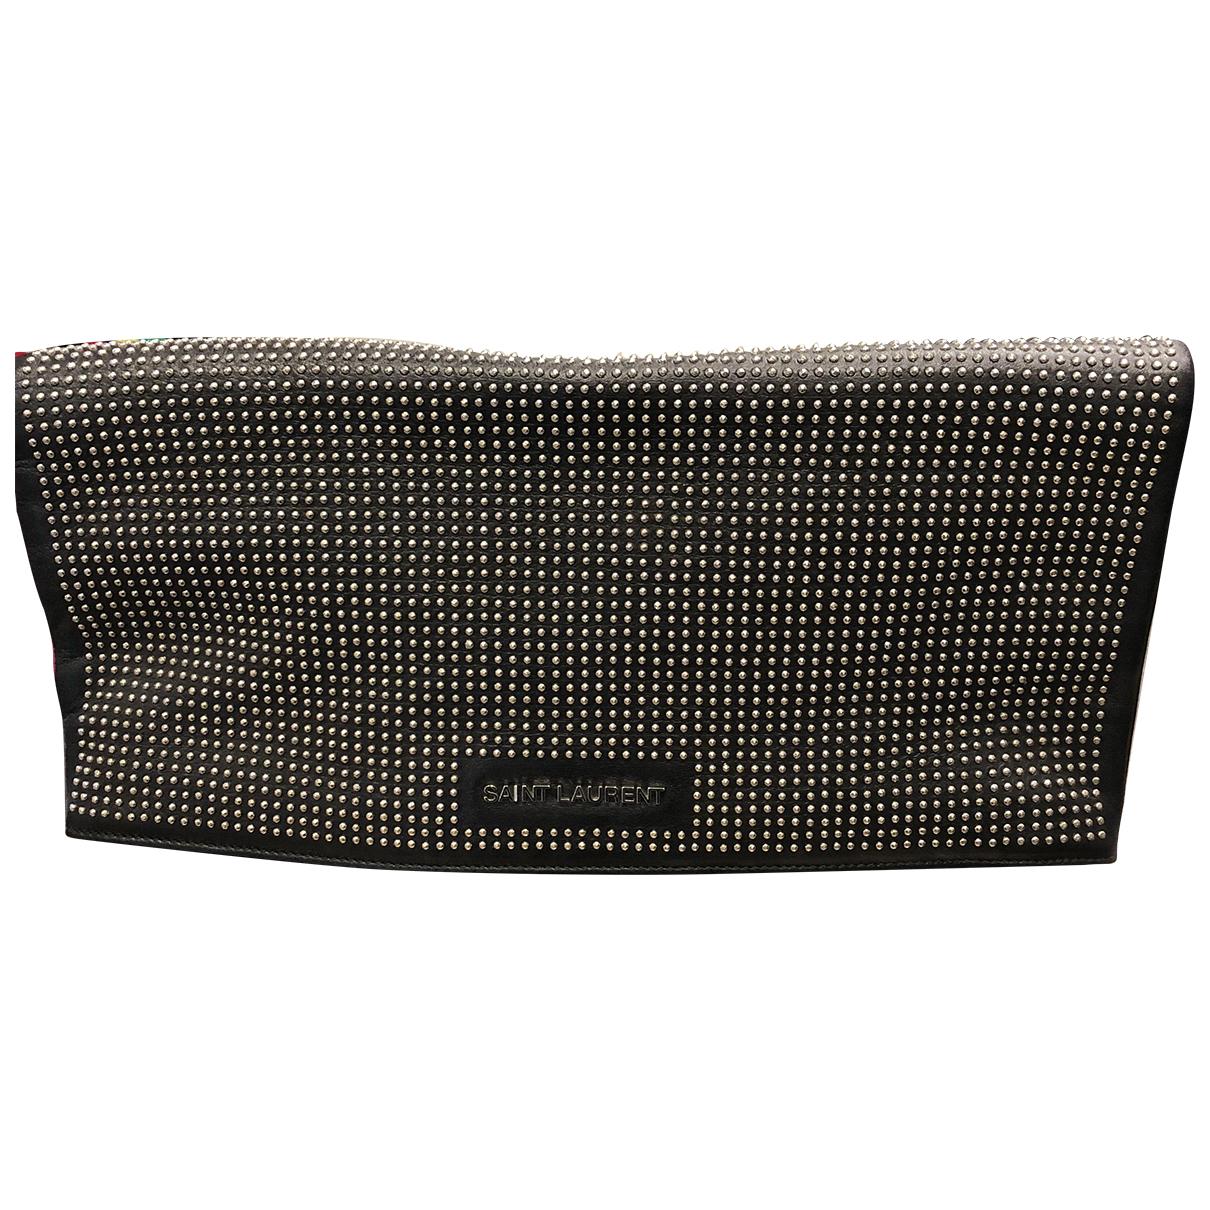 Saint Laurent N Black Leather Clutch bag for Women N